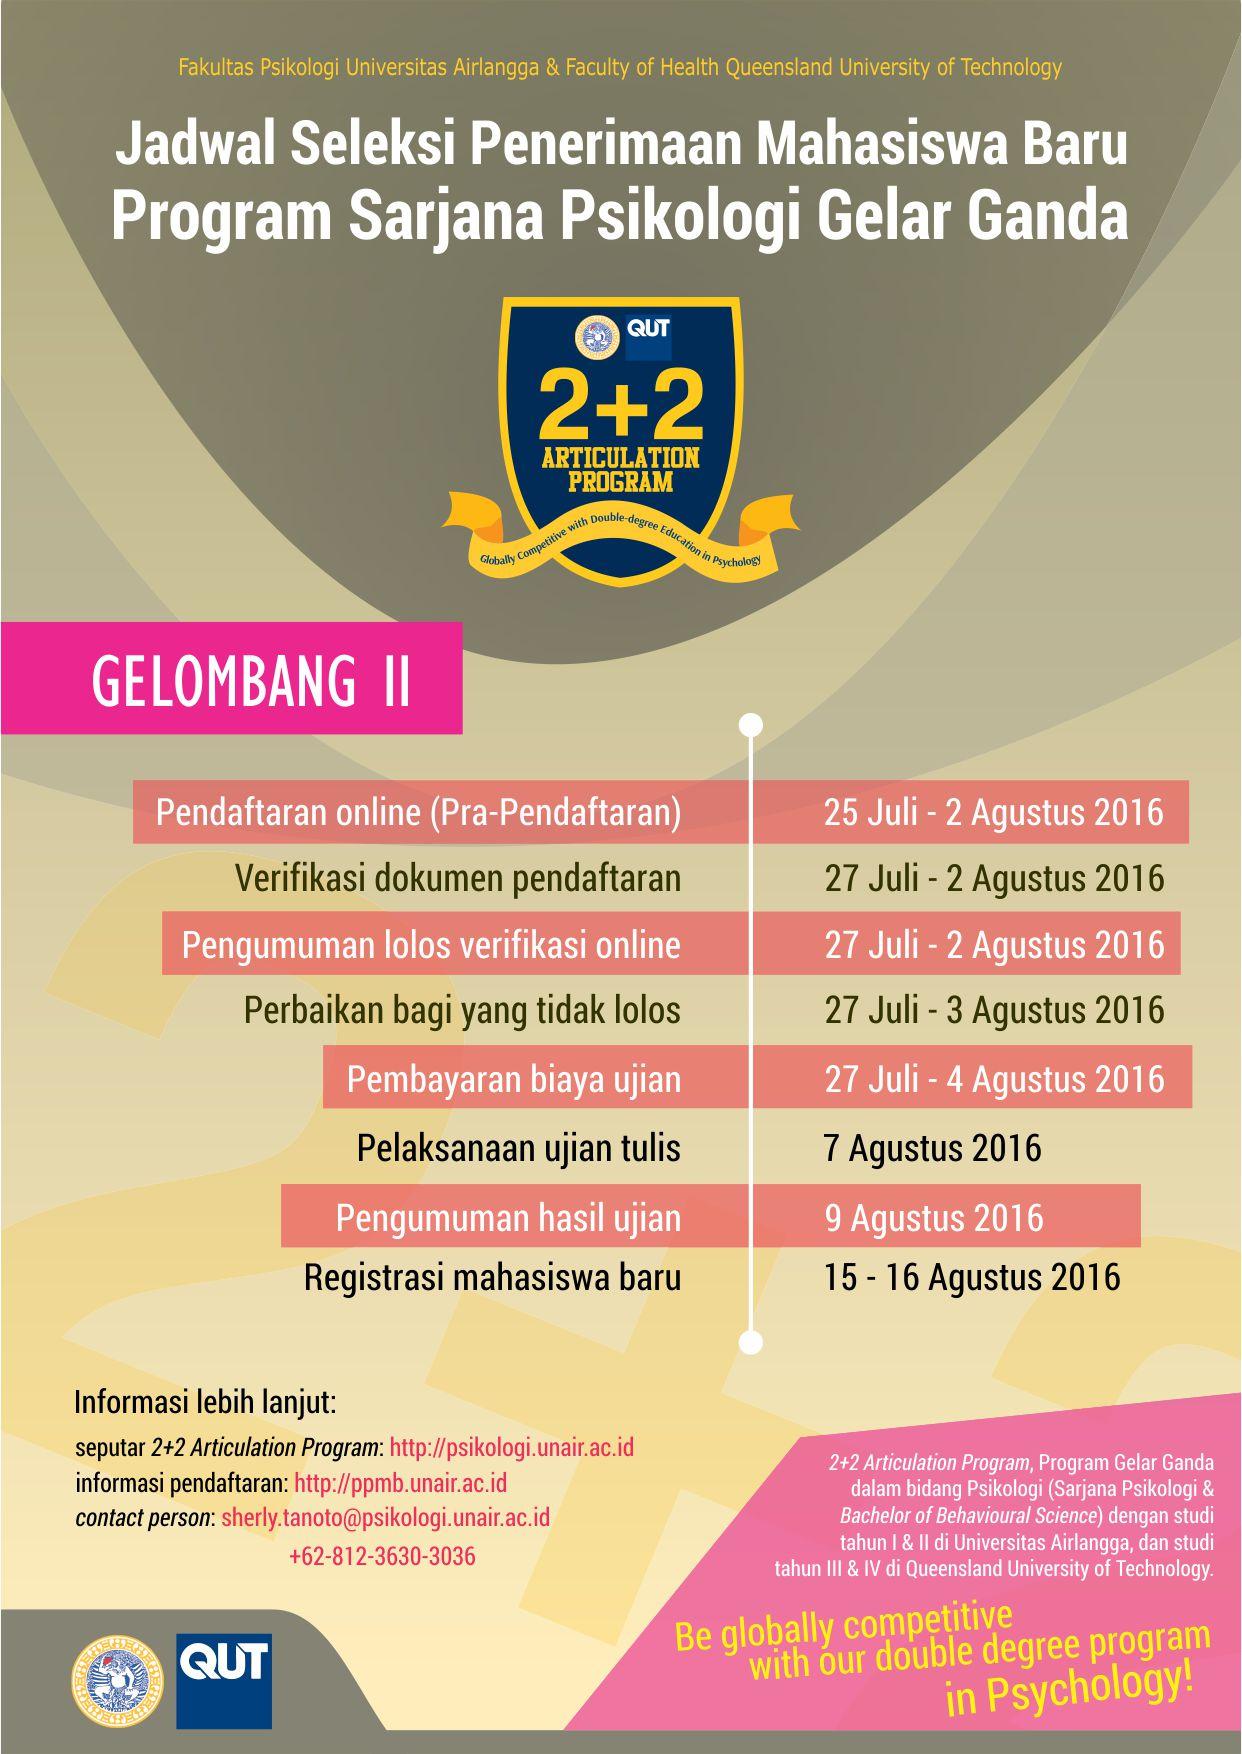 poster-jadwal penerimaan sarjana kelas internasional 2016-gel2